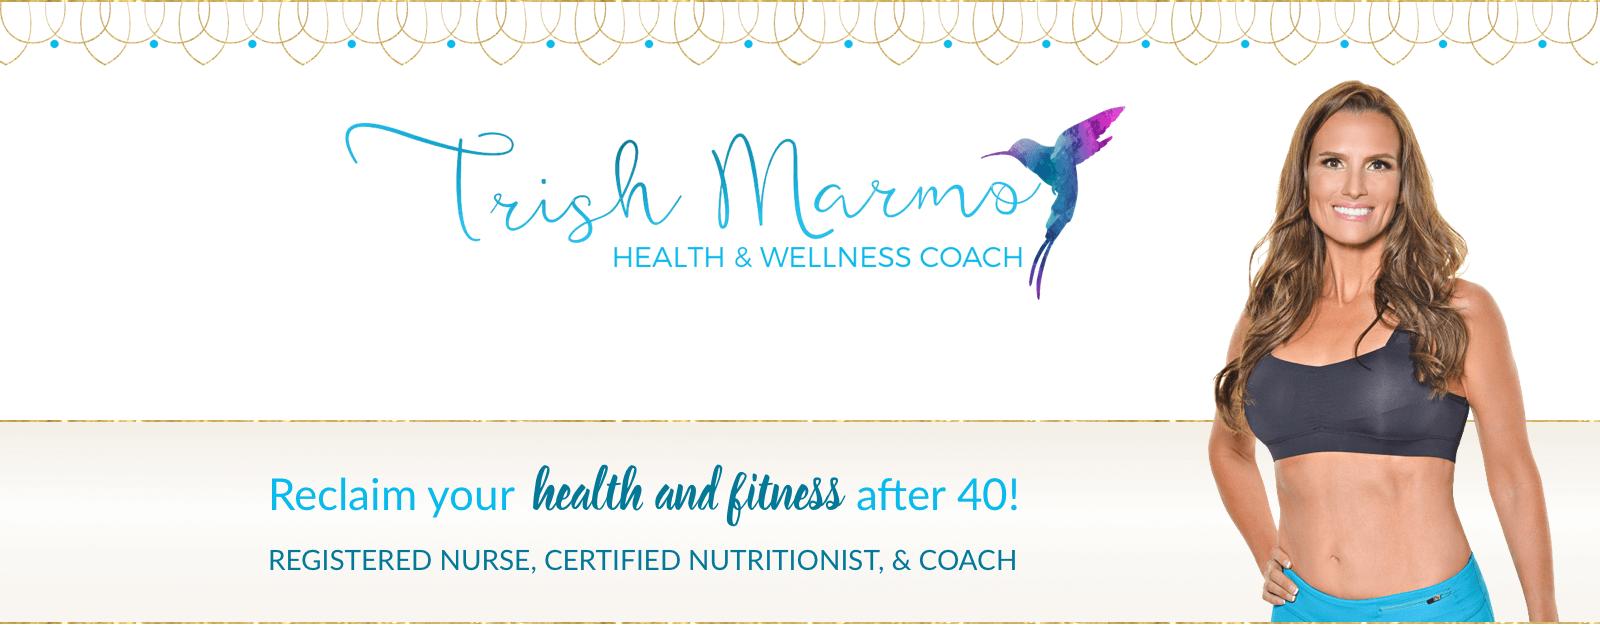 Trish Marma, Health & Wellness Coach